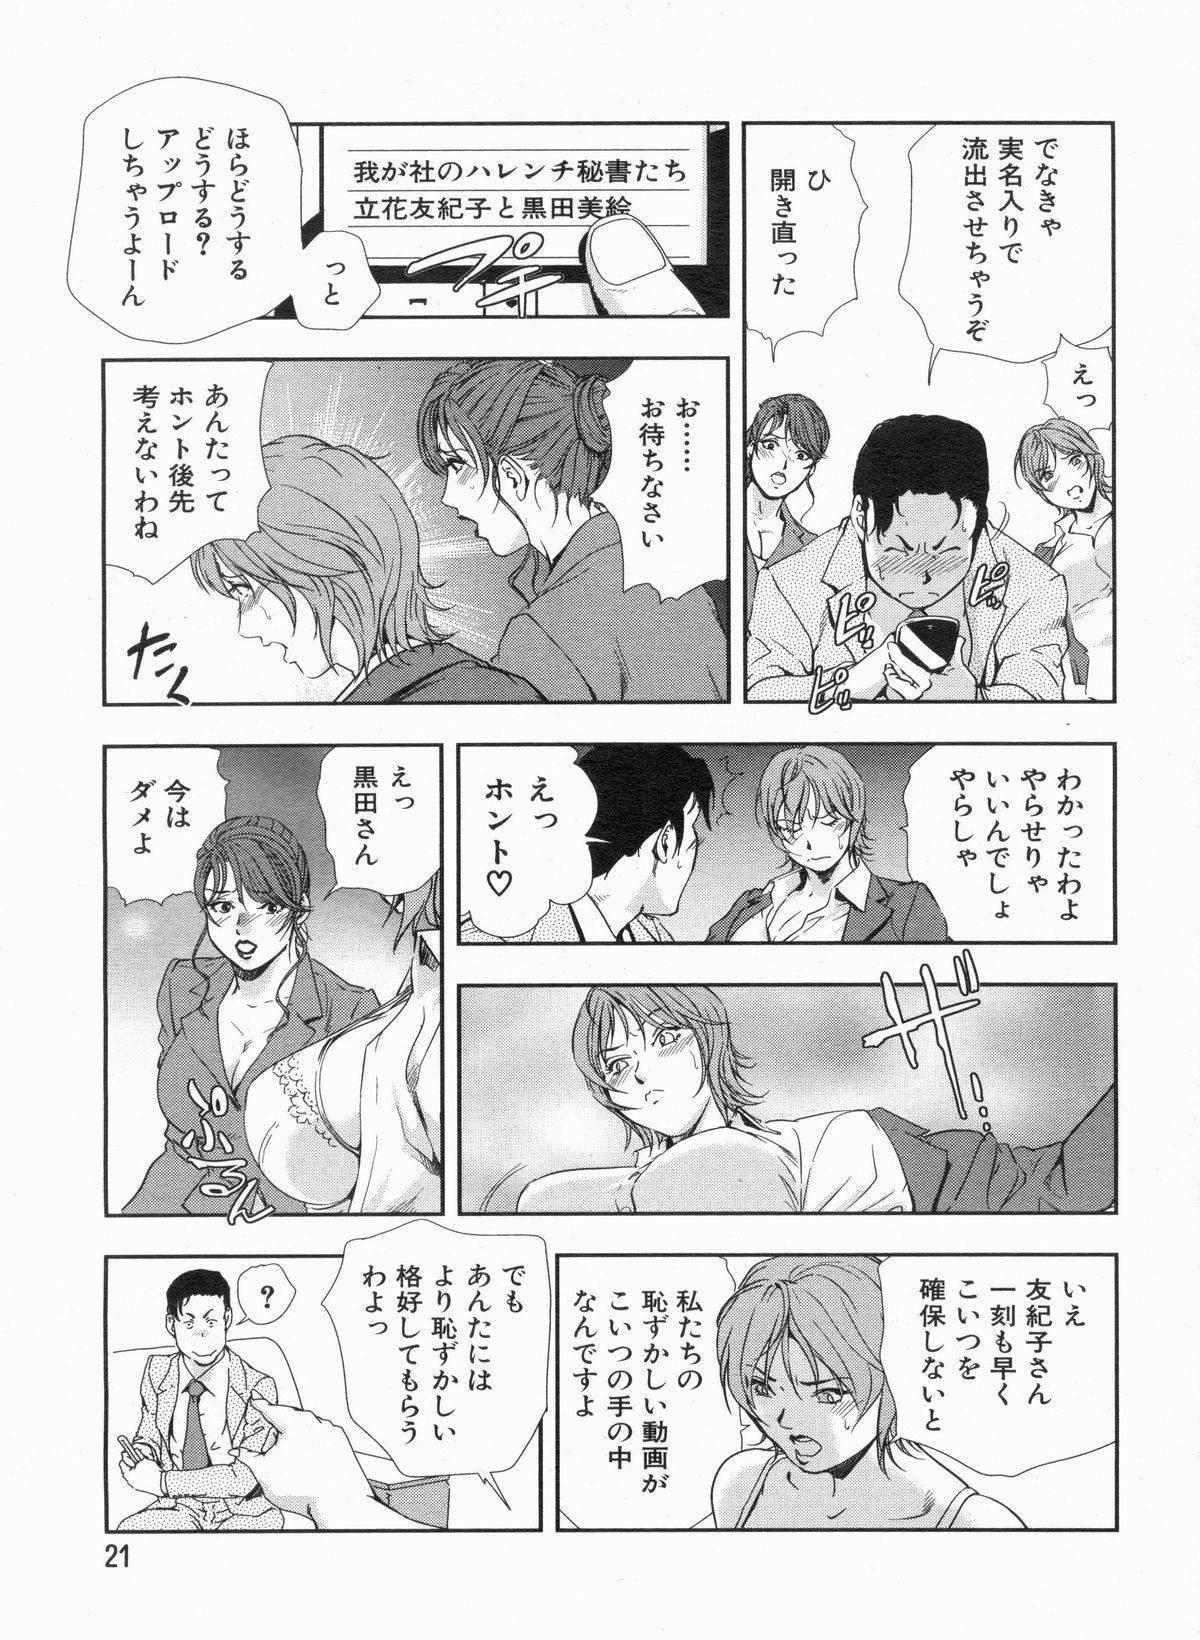 Manga Bon 2013-03 20